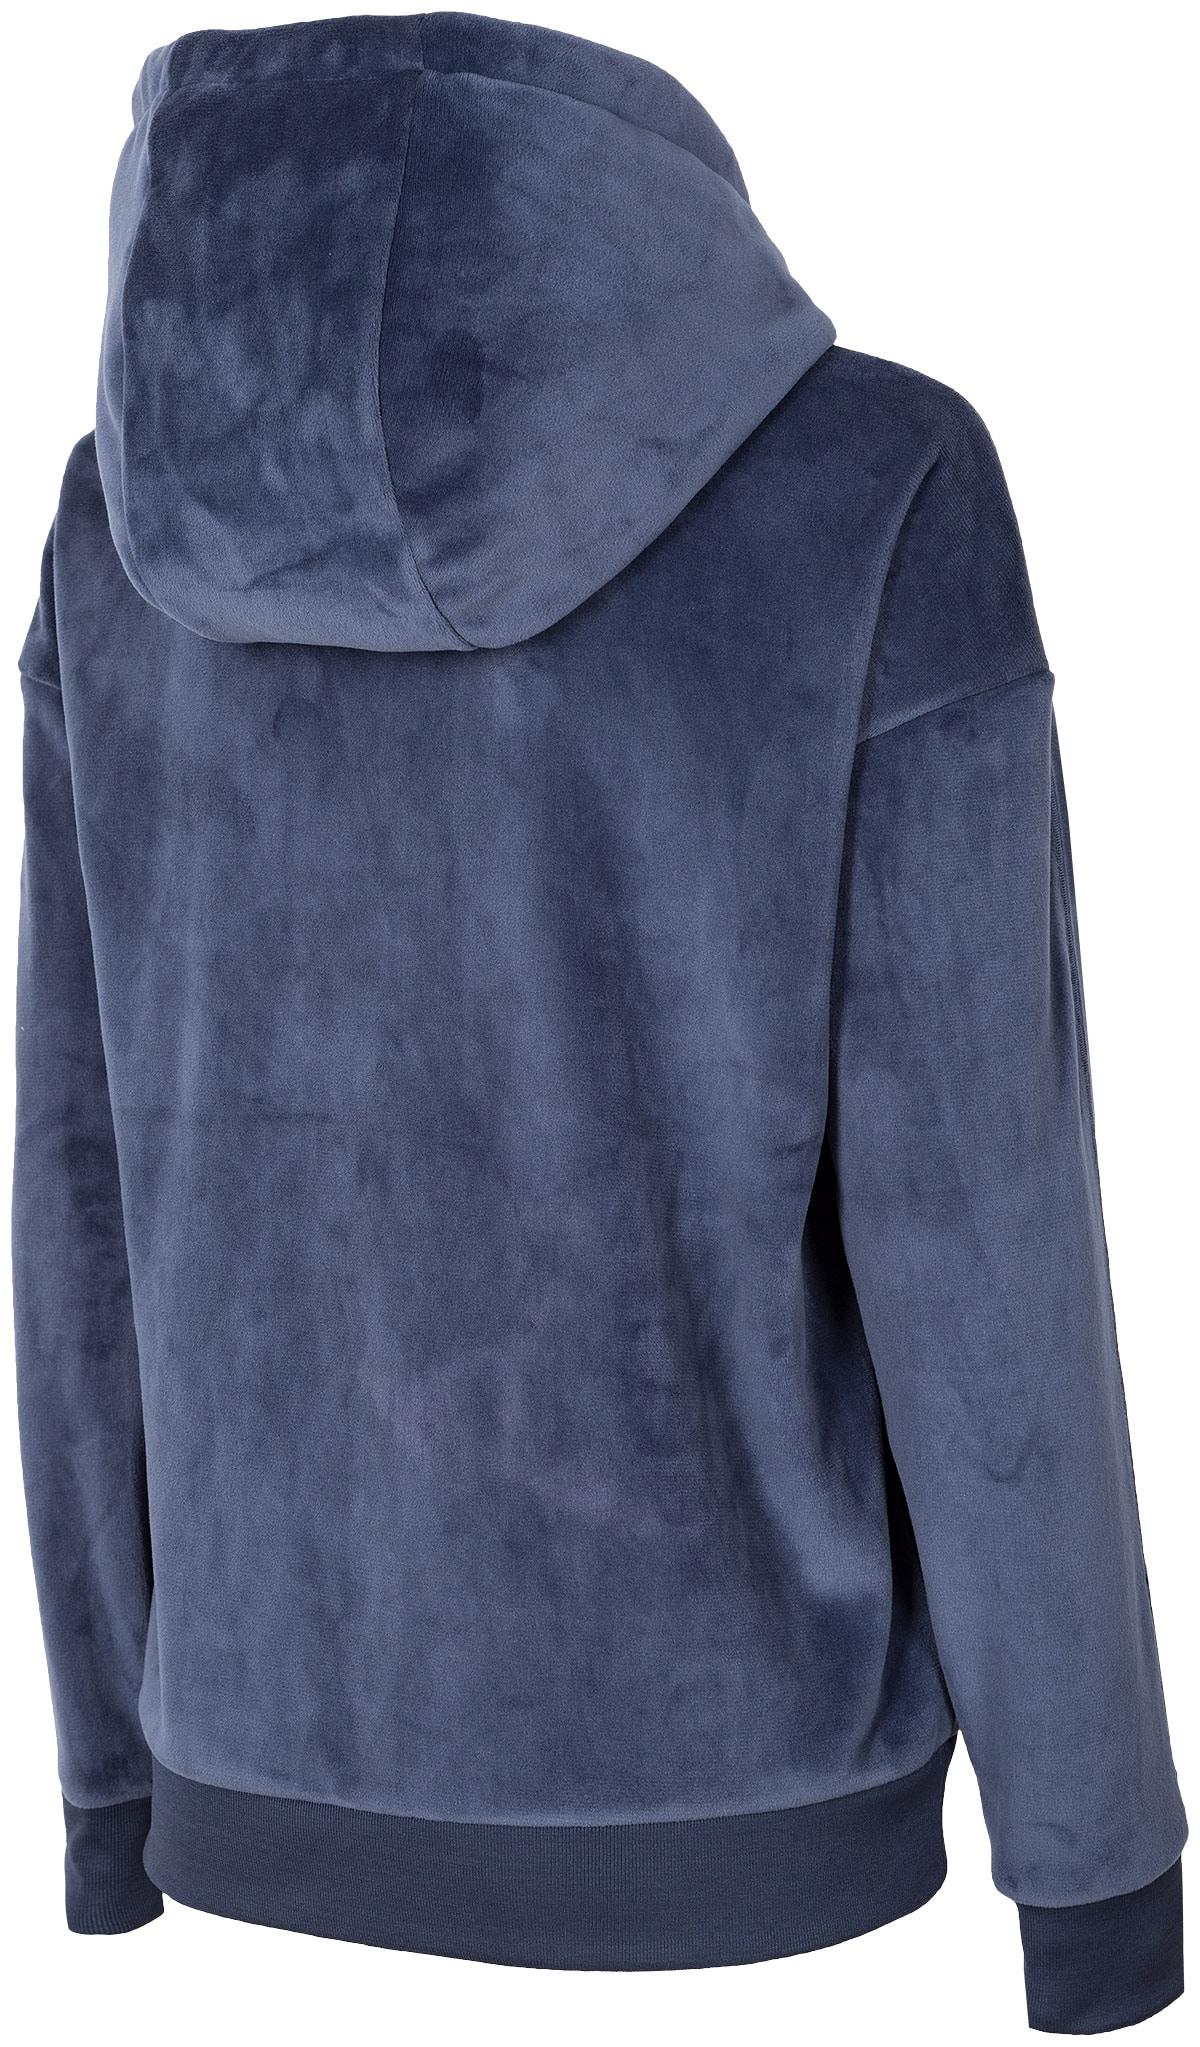 Bluza damska BLD228 ciemny granat